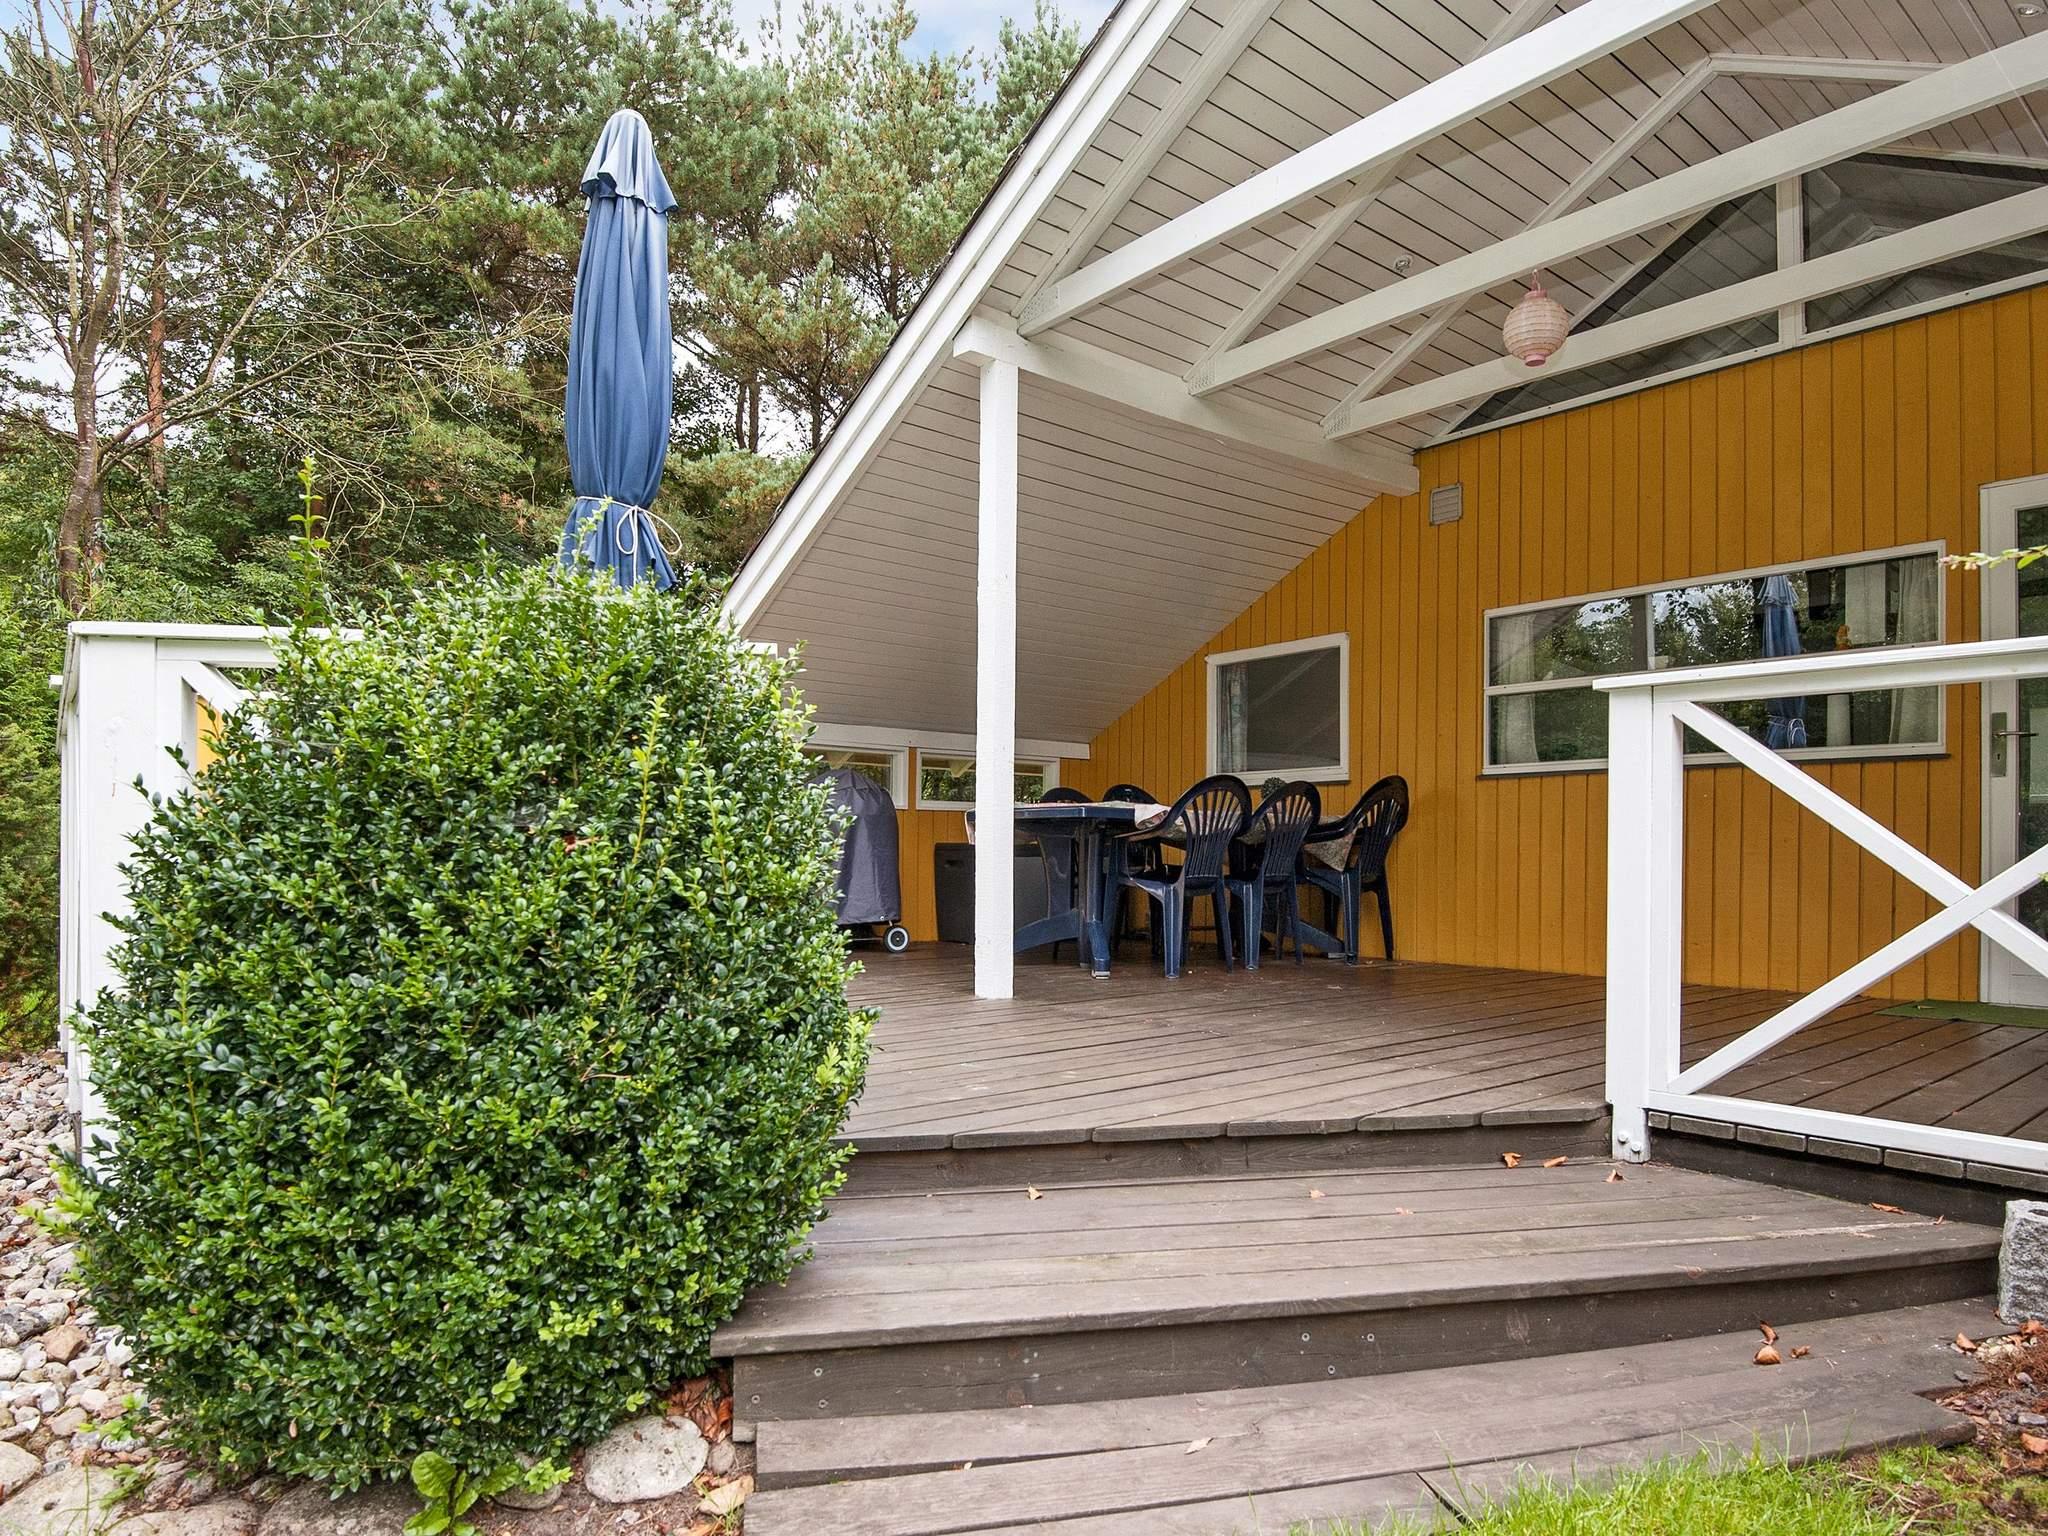 Ferienhaus Arrild (87701), Arrild, , Südwestjütland, Dänemark, Bild 13